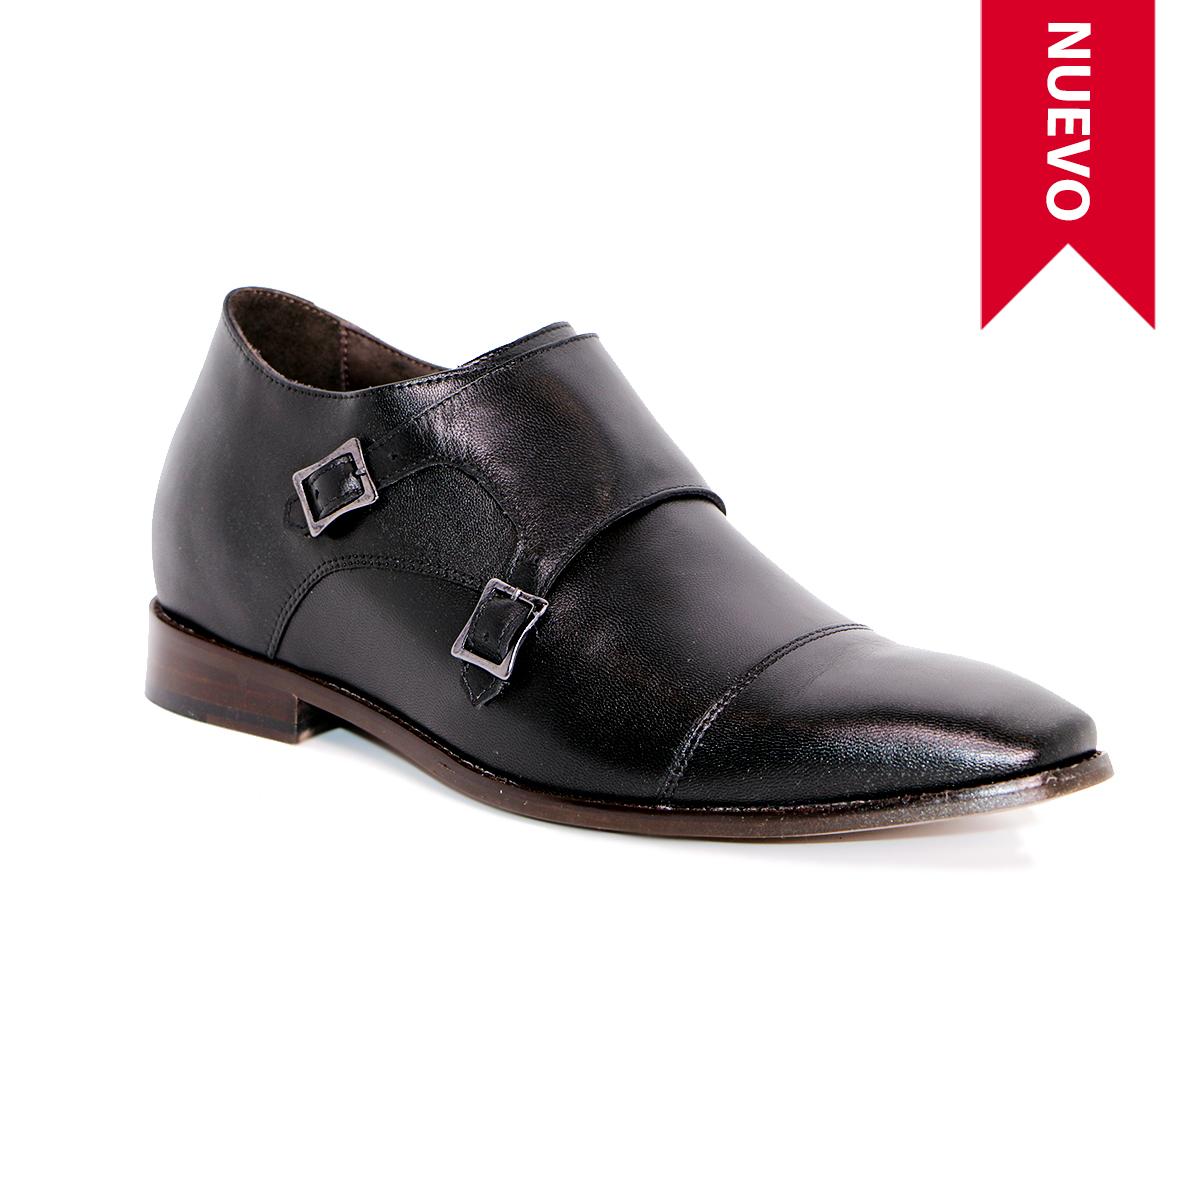 Zapato Formal Lawyers Negro Max Denegri +7cms de Altura_72739